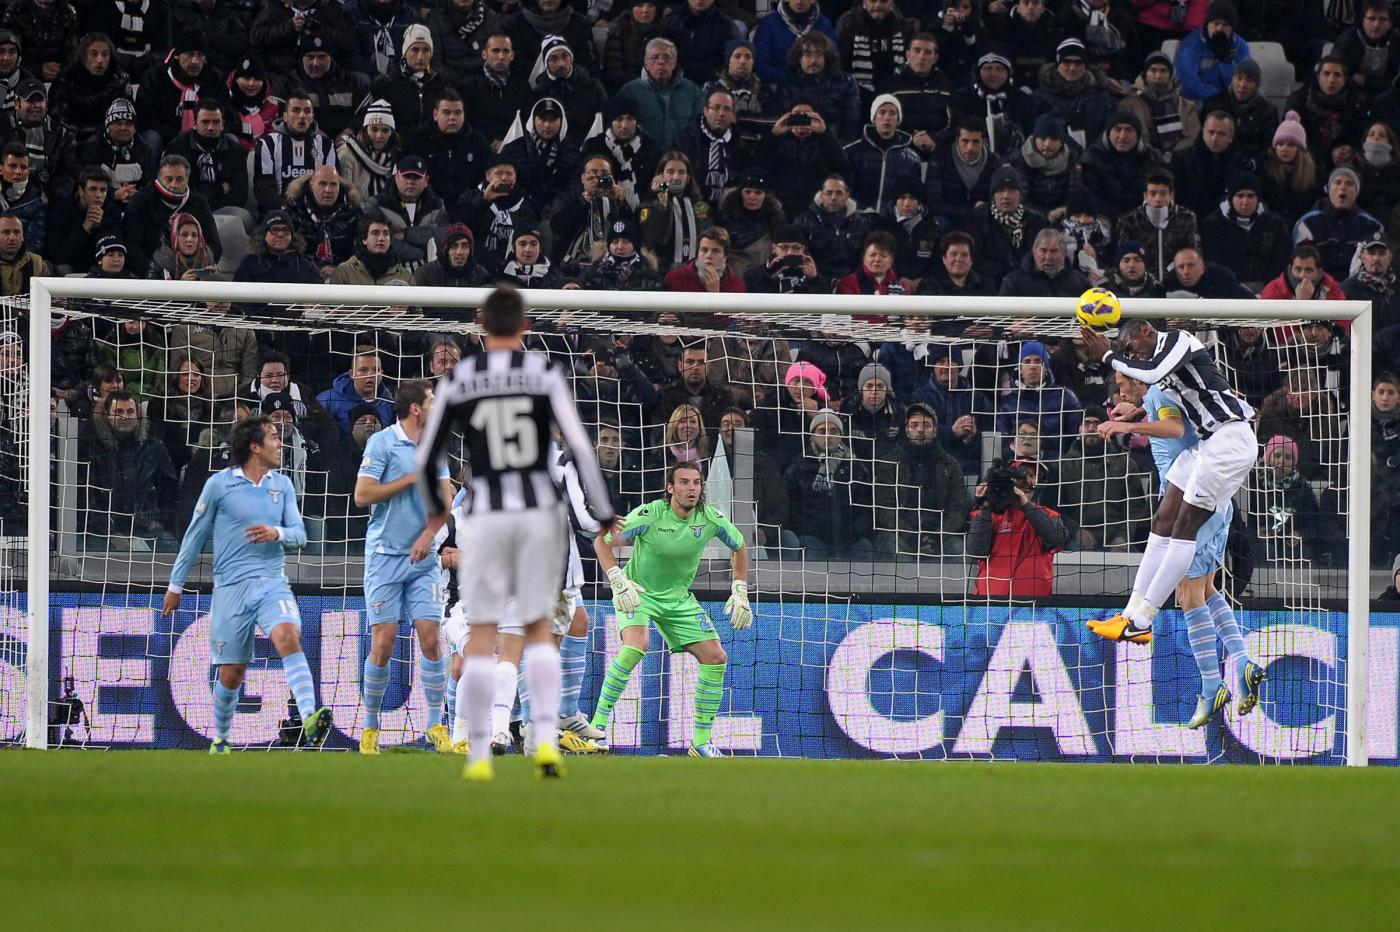 Ascolti tv martedì 22 gennaio 2013: vince Juve-Lazio e Ballarò batte Canale 5